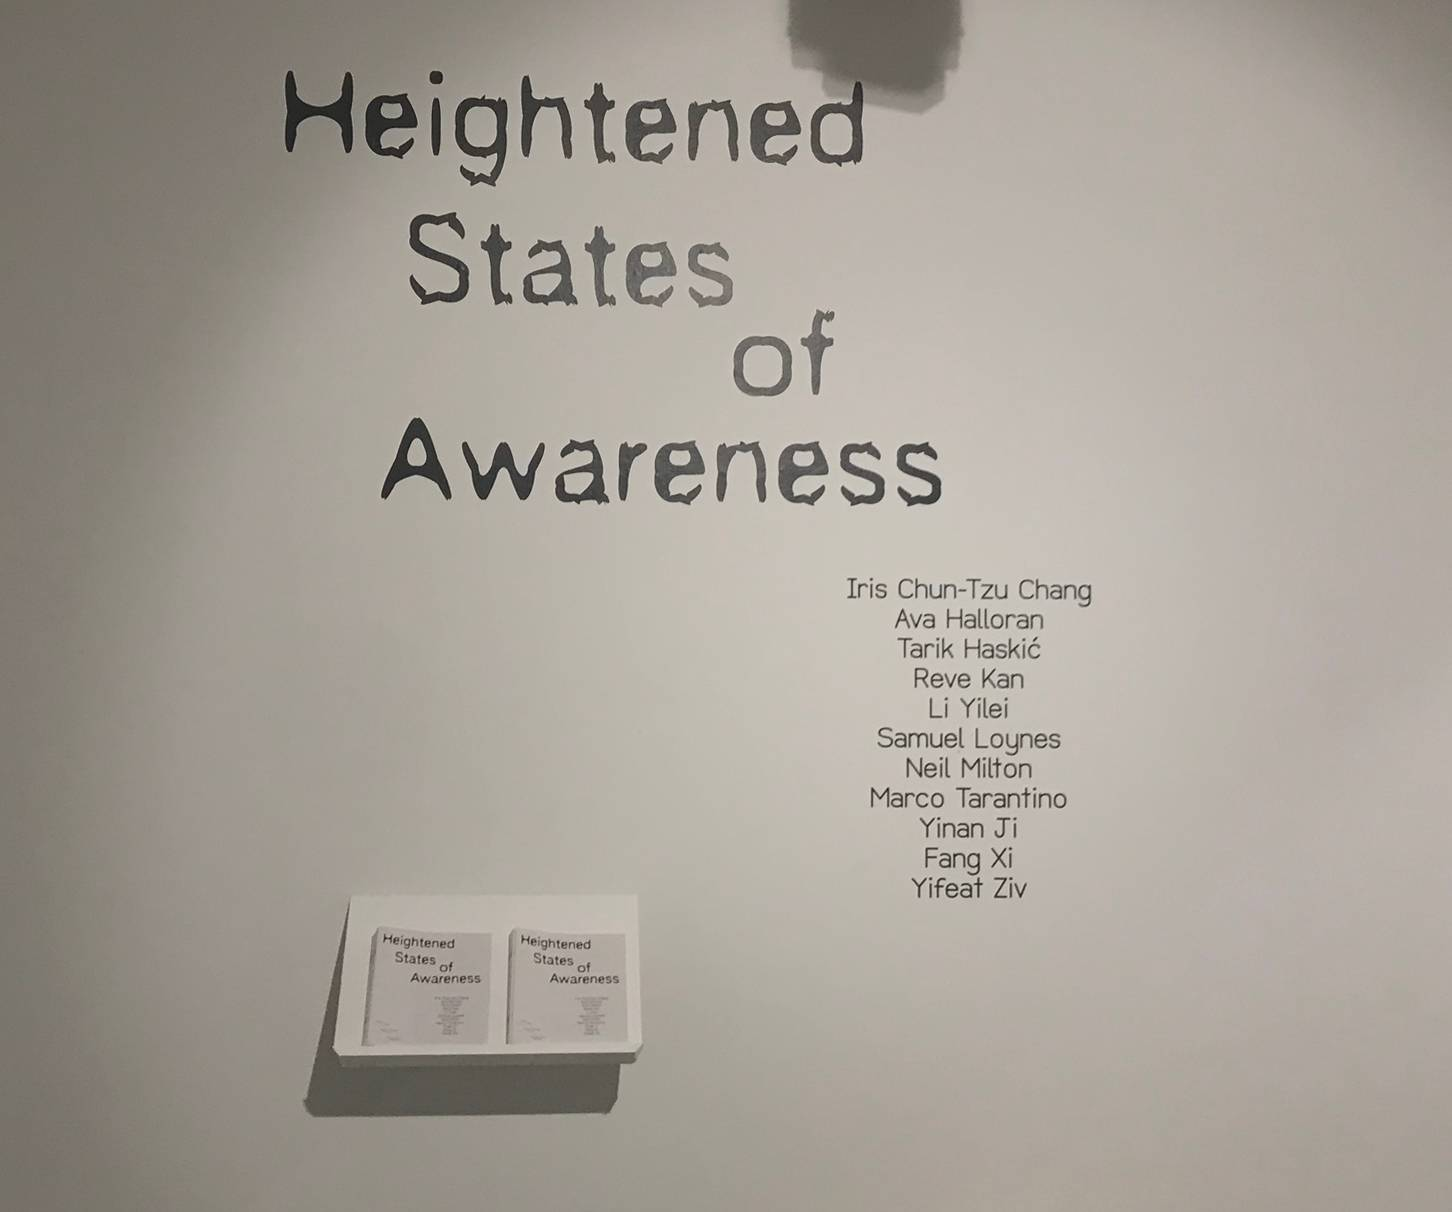 Heightened States of Awareness (2019)